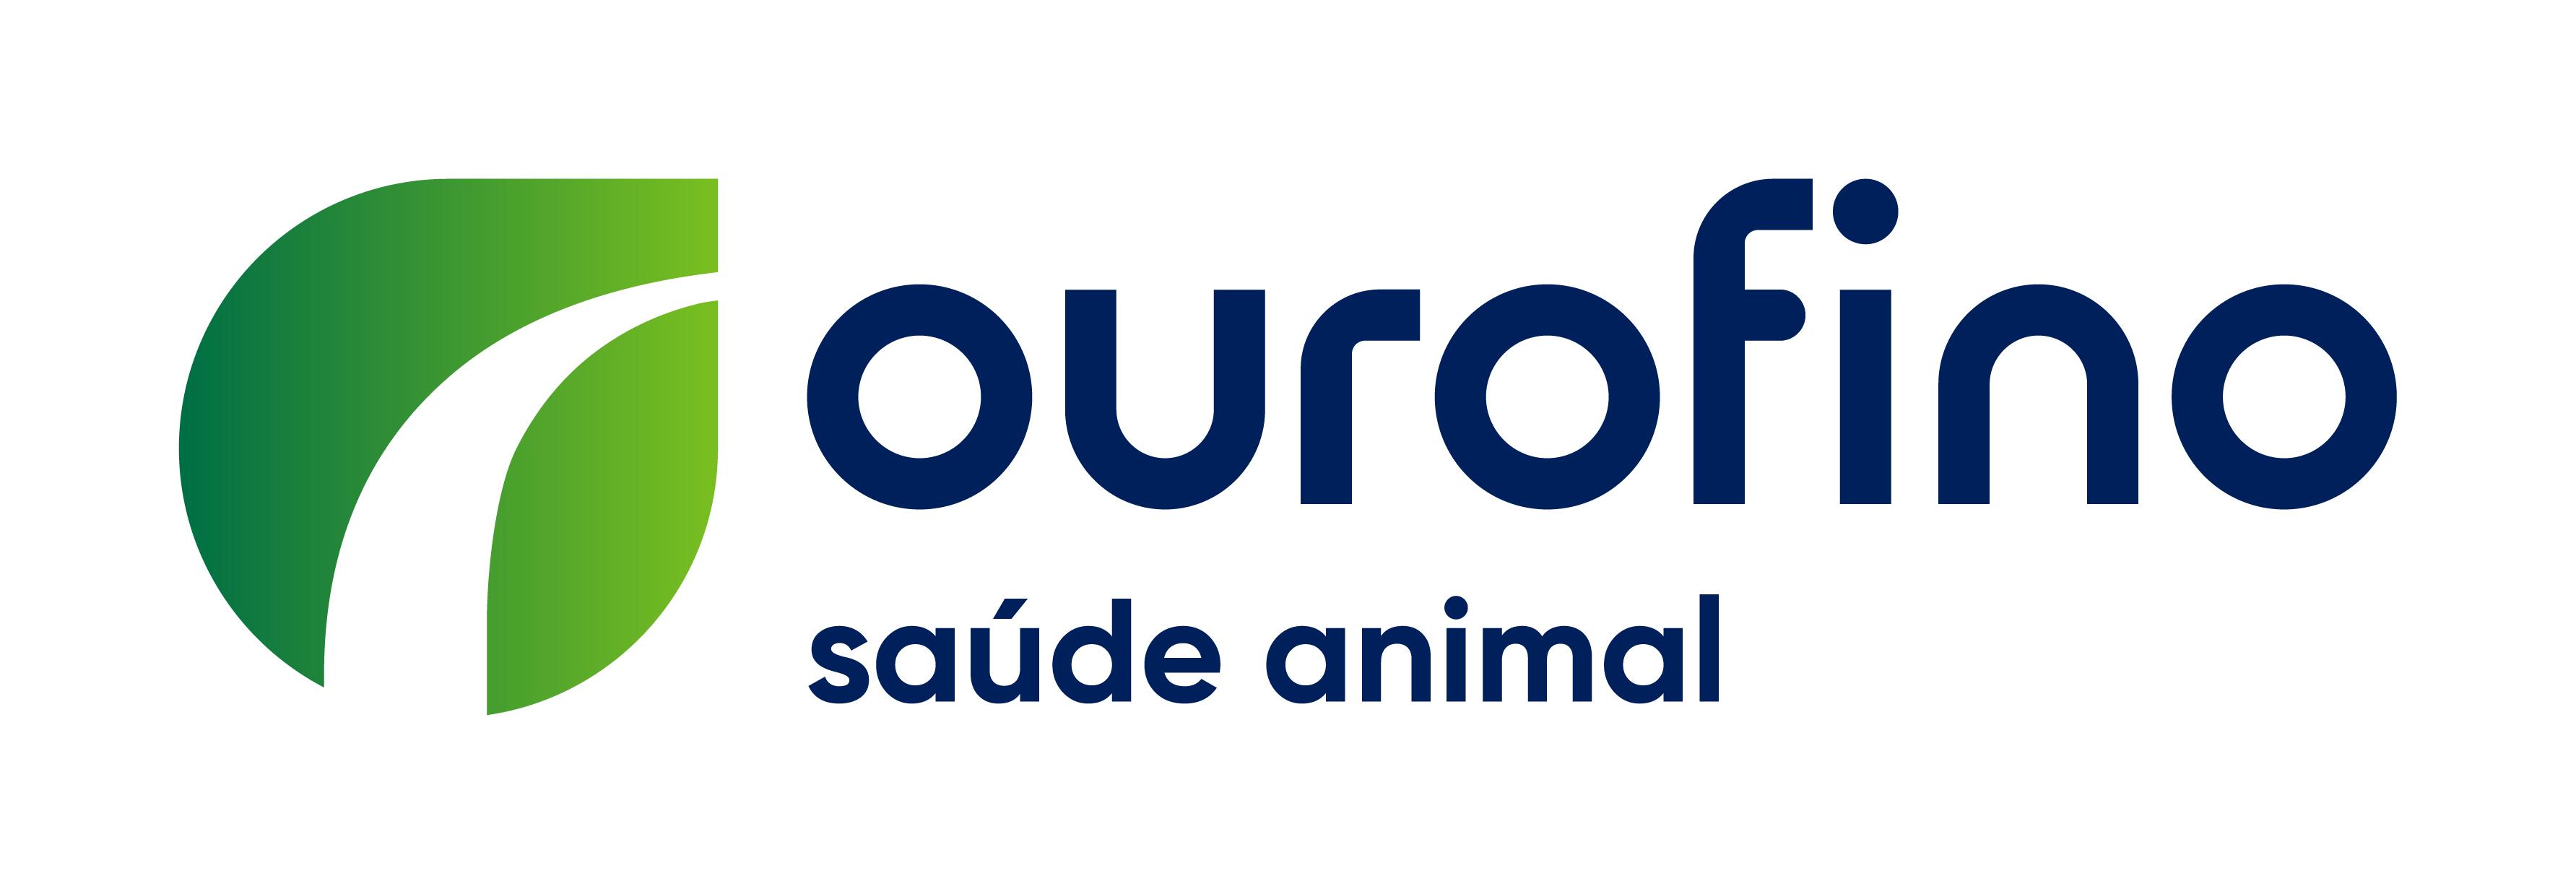 Contato | Ourofino Saúde Animal